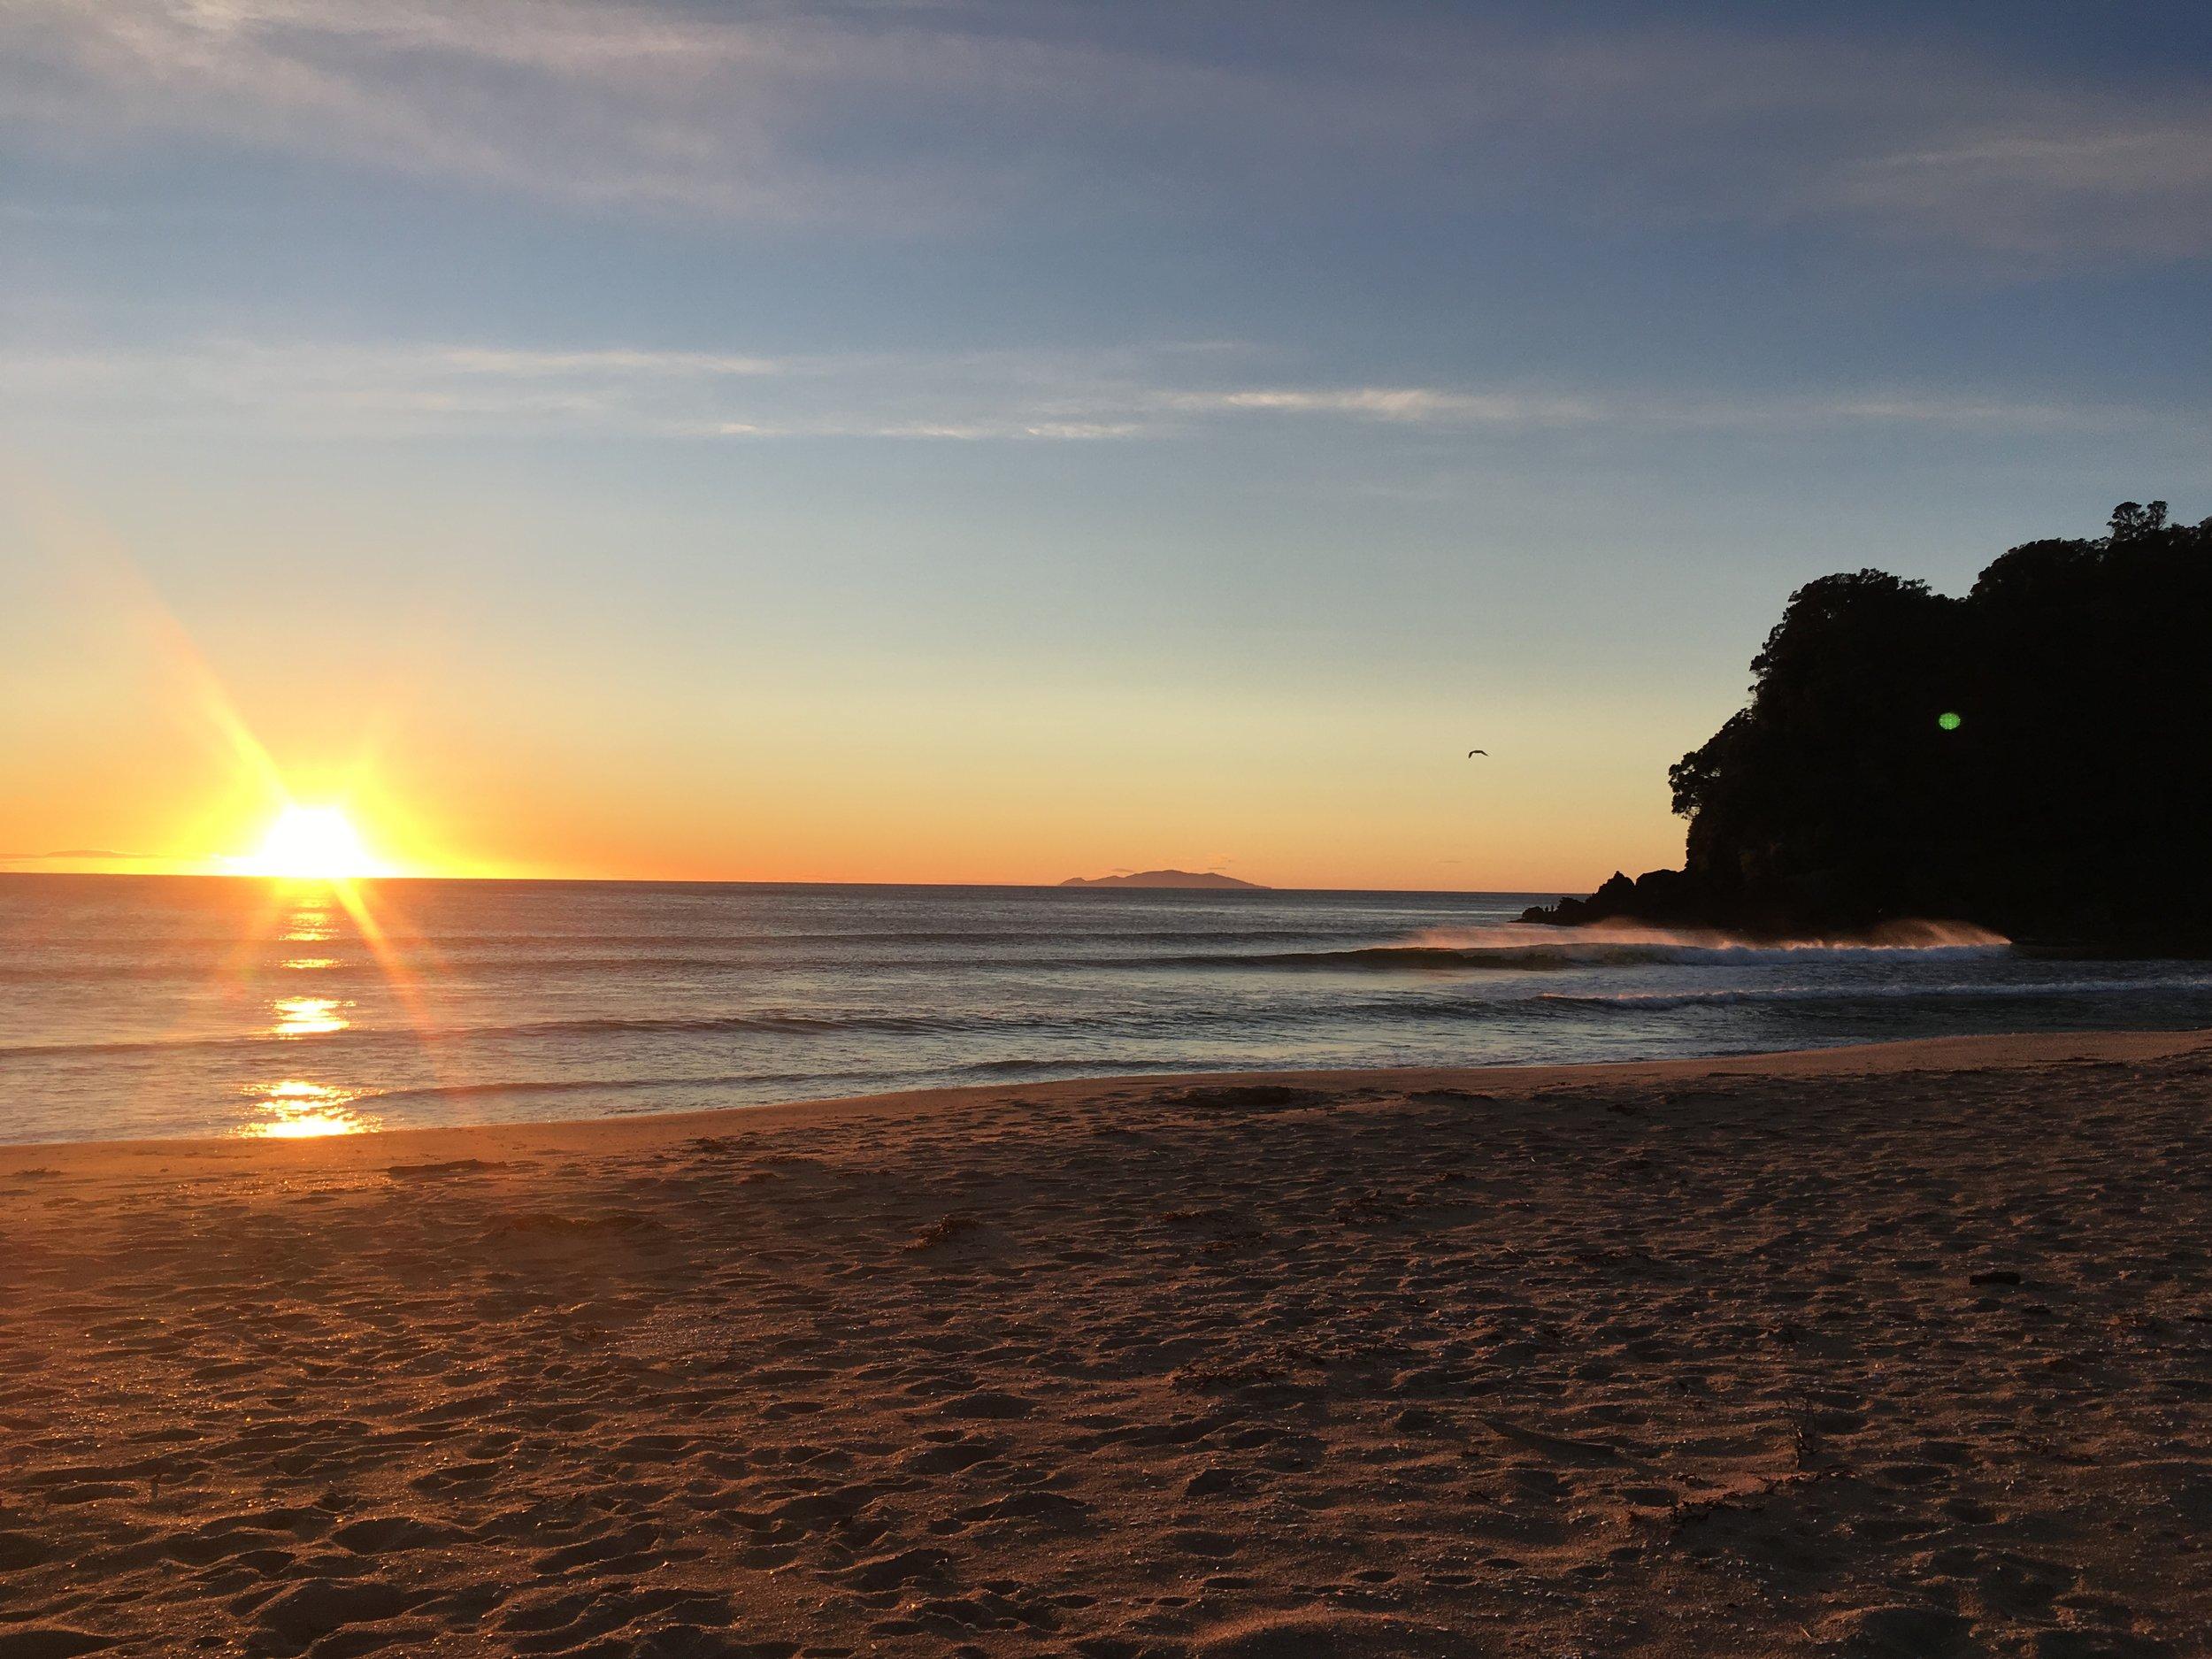 Onemana beach on Saturday morning